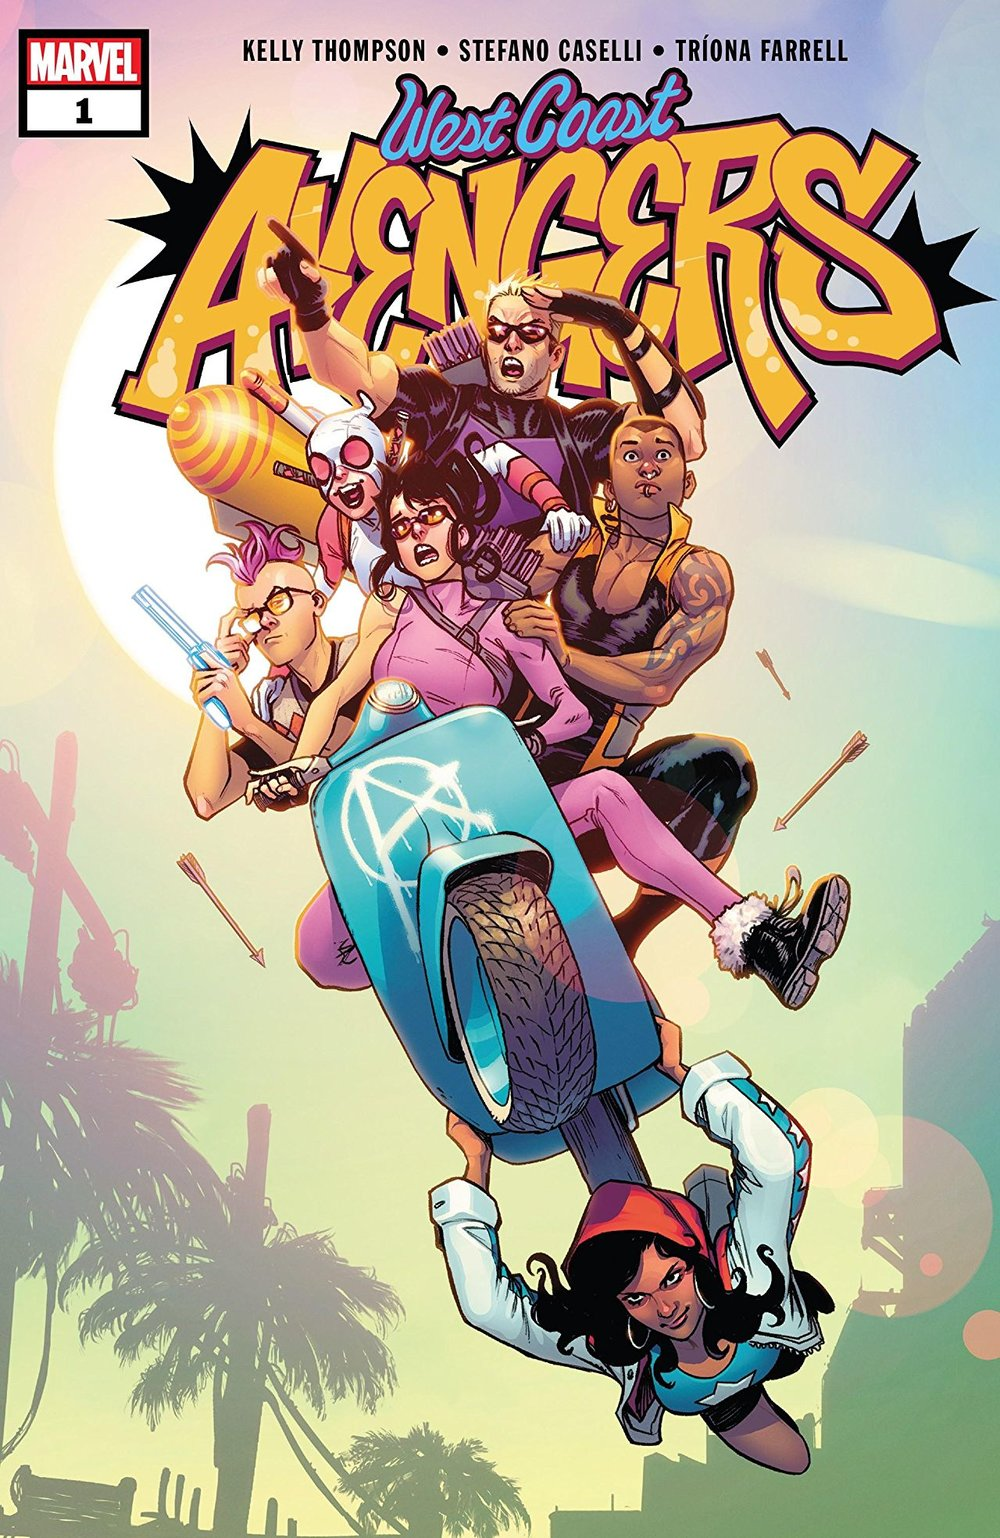 West Coast Avengers #1 - Writer: Kelly ThompsonArtist: Stefano CaselliColor Artist: Triona FarrellLetterer: VC's Joe CaramagnaCover: Stefano Caselli & Nolan Woodard